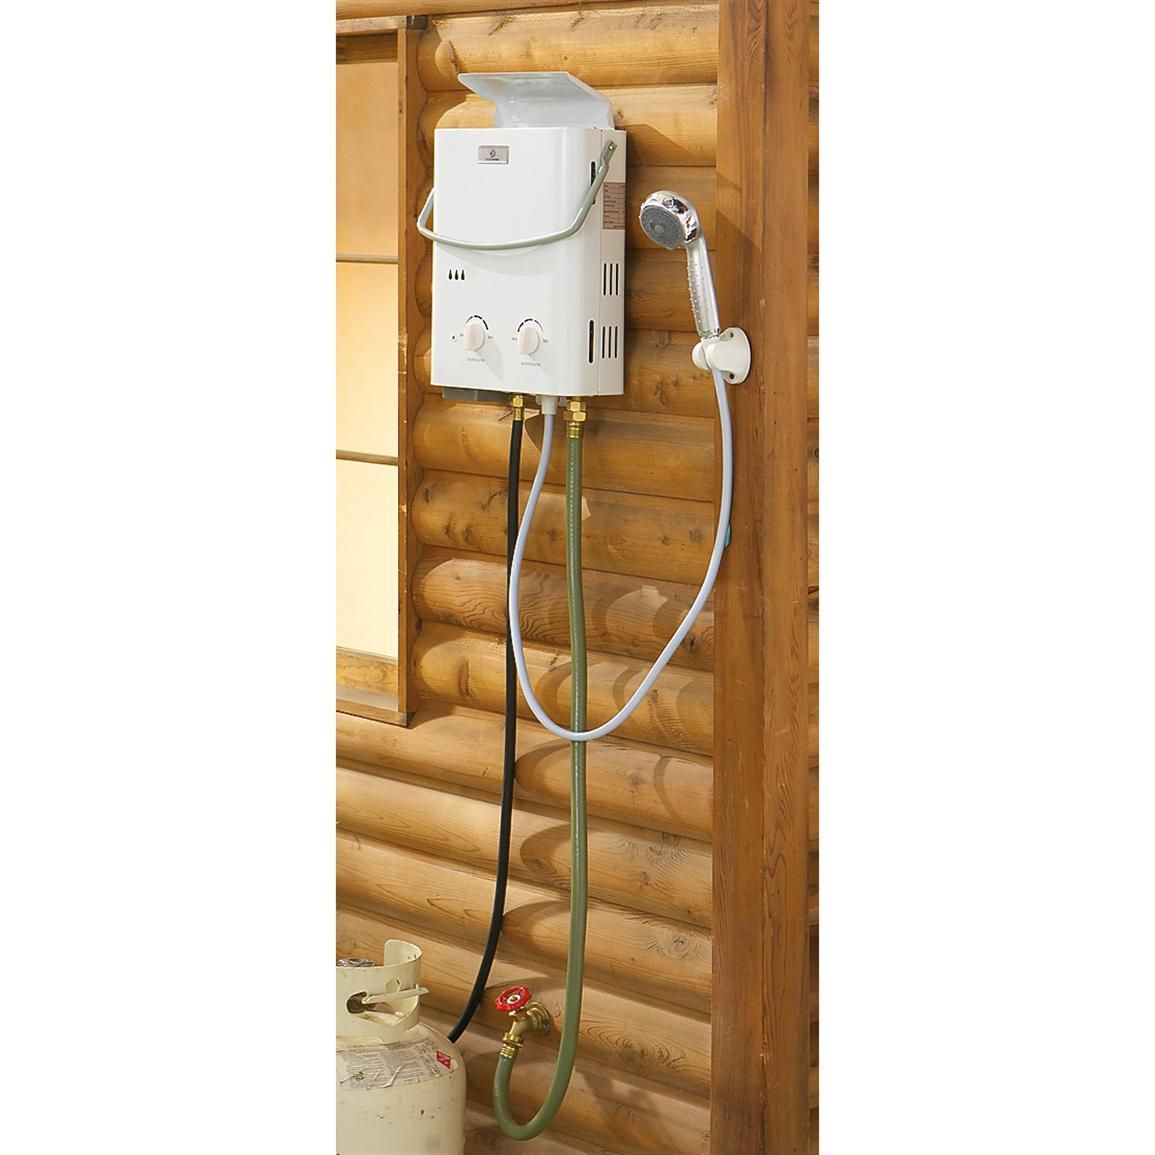 Eccotemp L7 1 7 Gpm Portable 41 000 Btu Liquid Propane Outdoor Tankless Water Heater Outdoor Shower Tankless Water Heater Water Heater